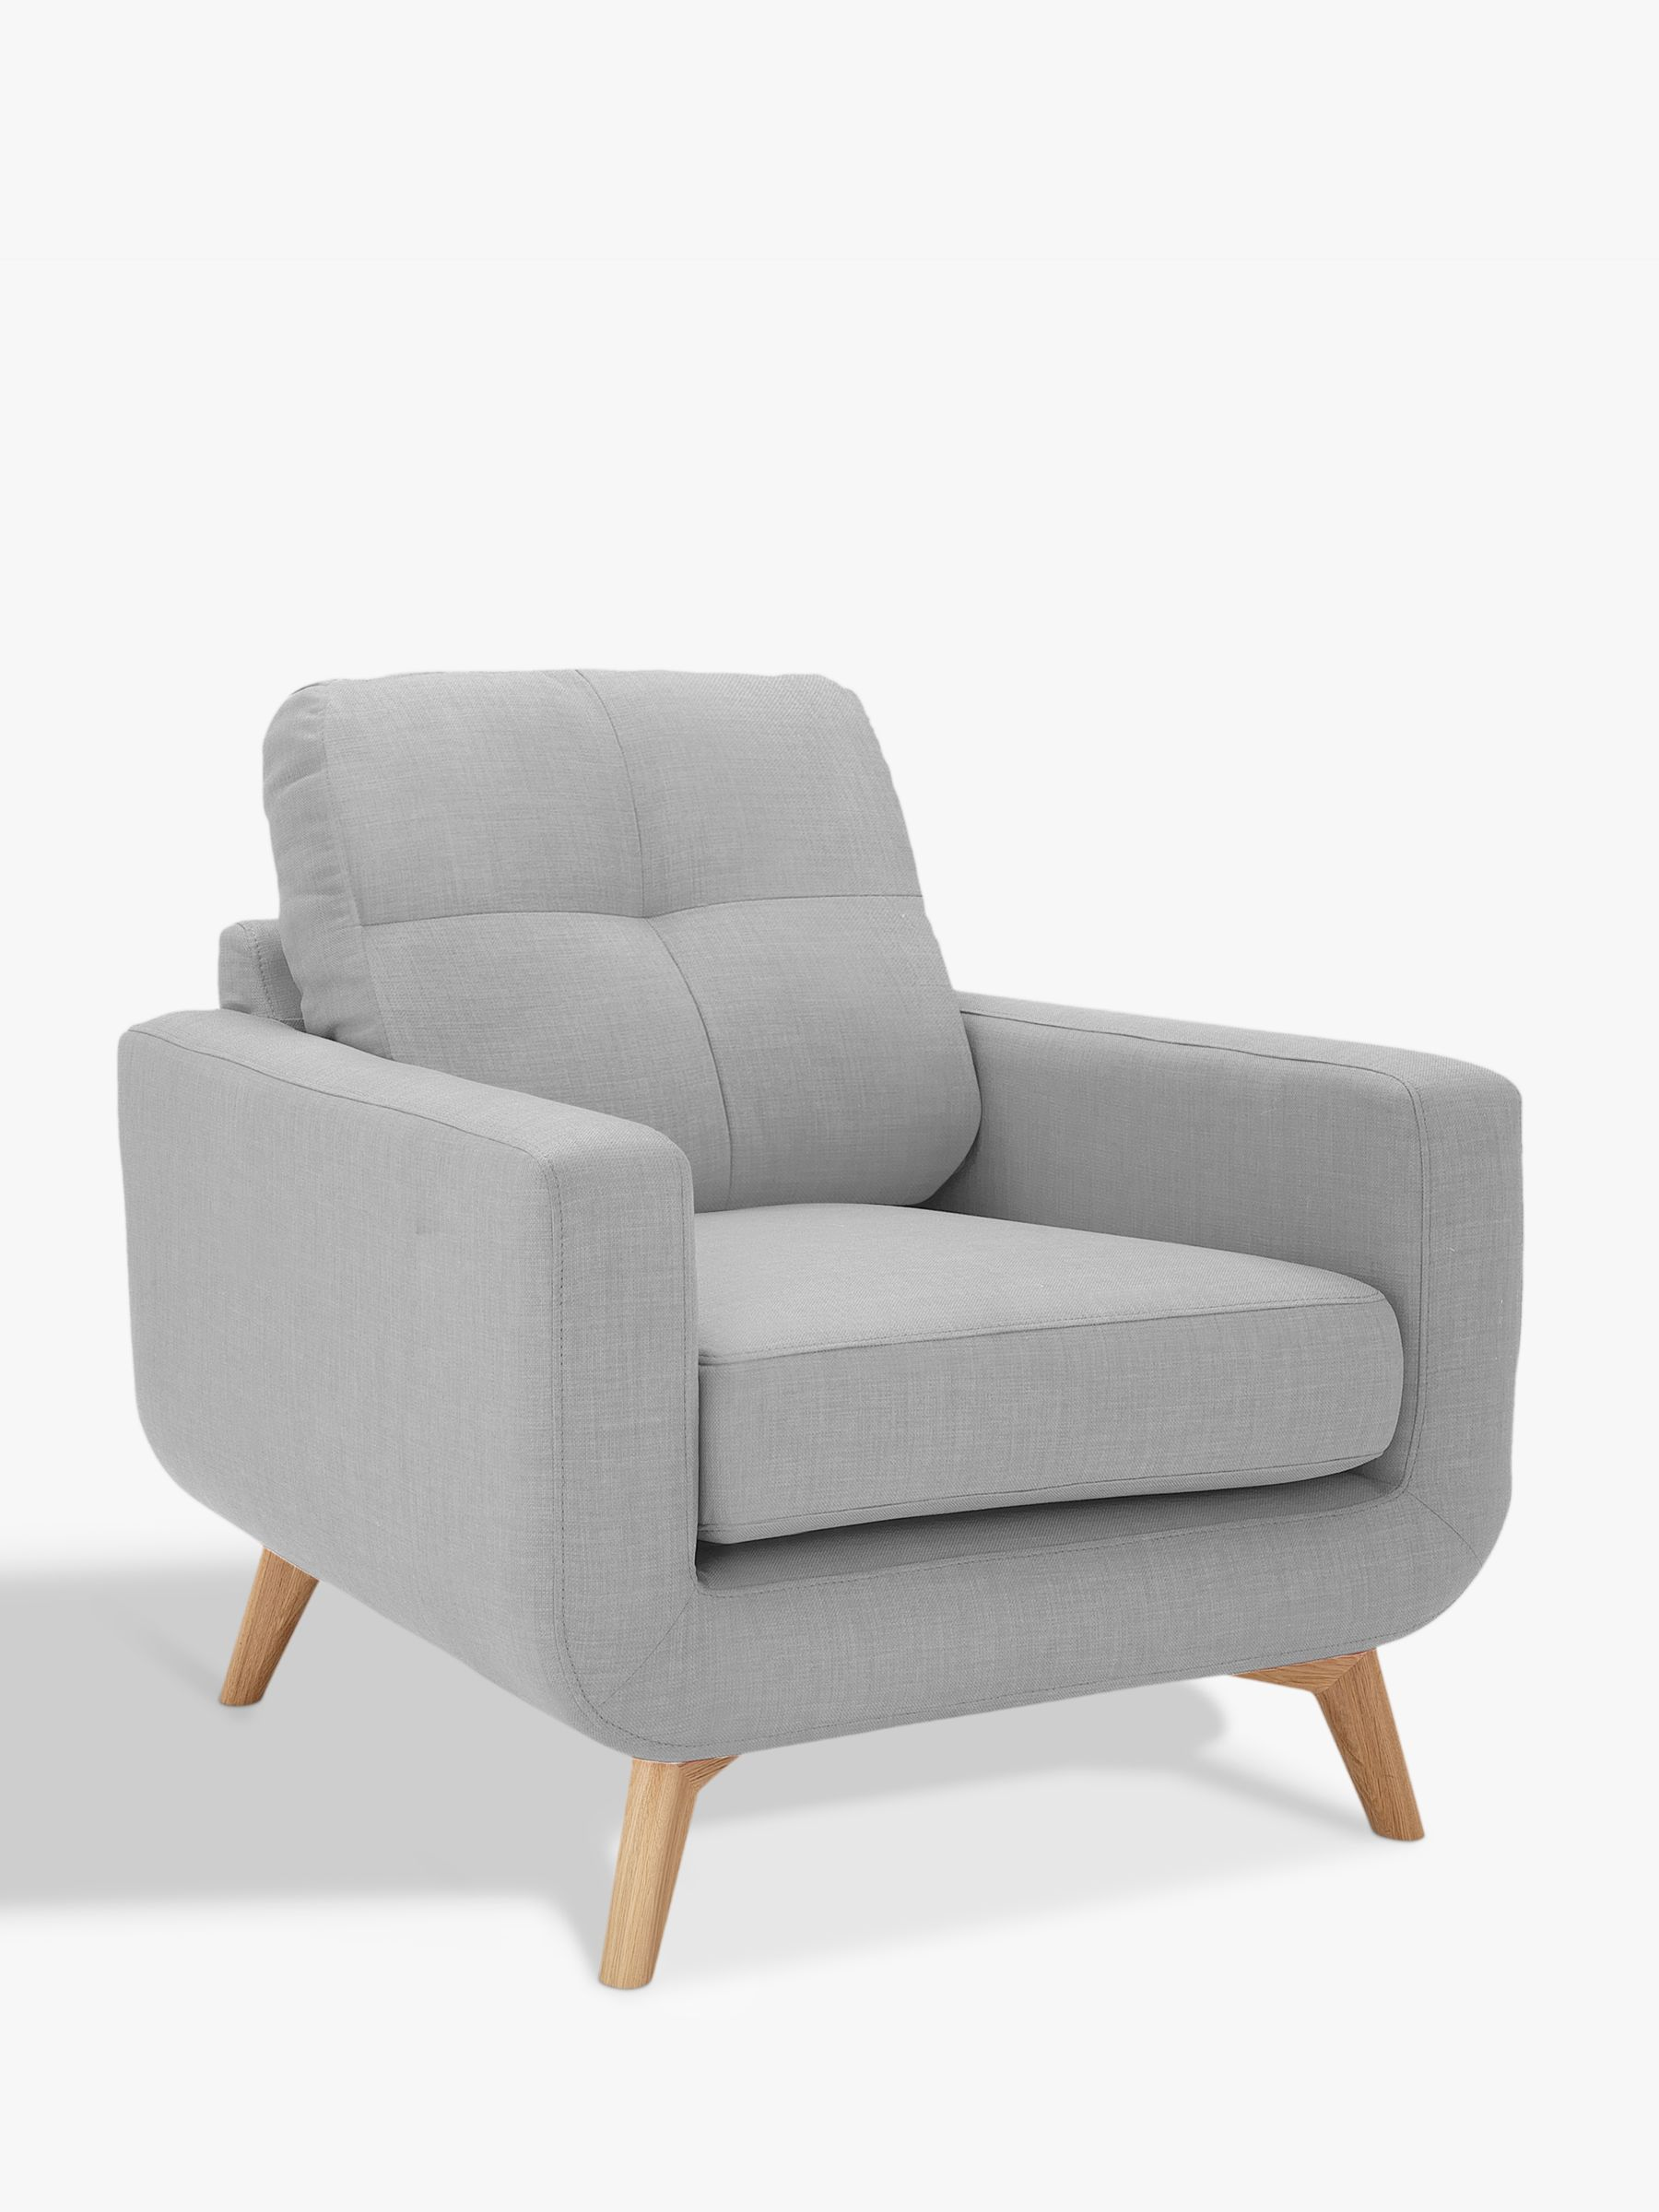 John Lewis & Partners Barbican Armchair | Armchair, Design ...